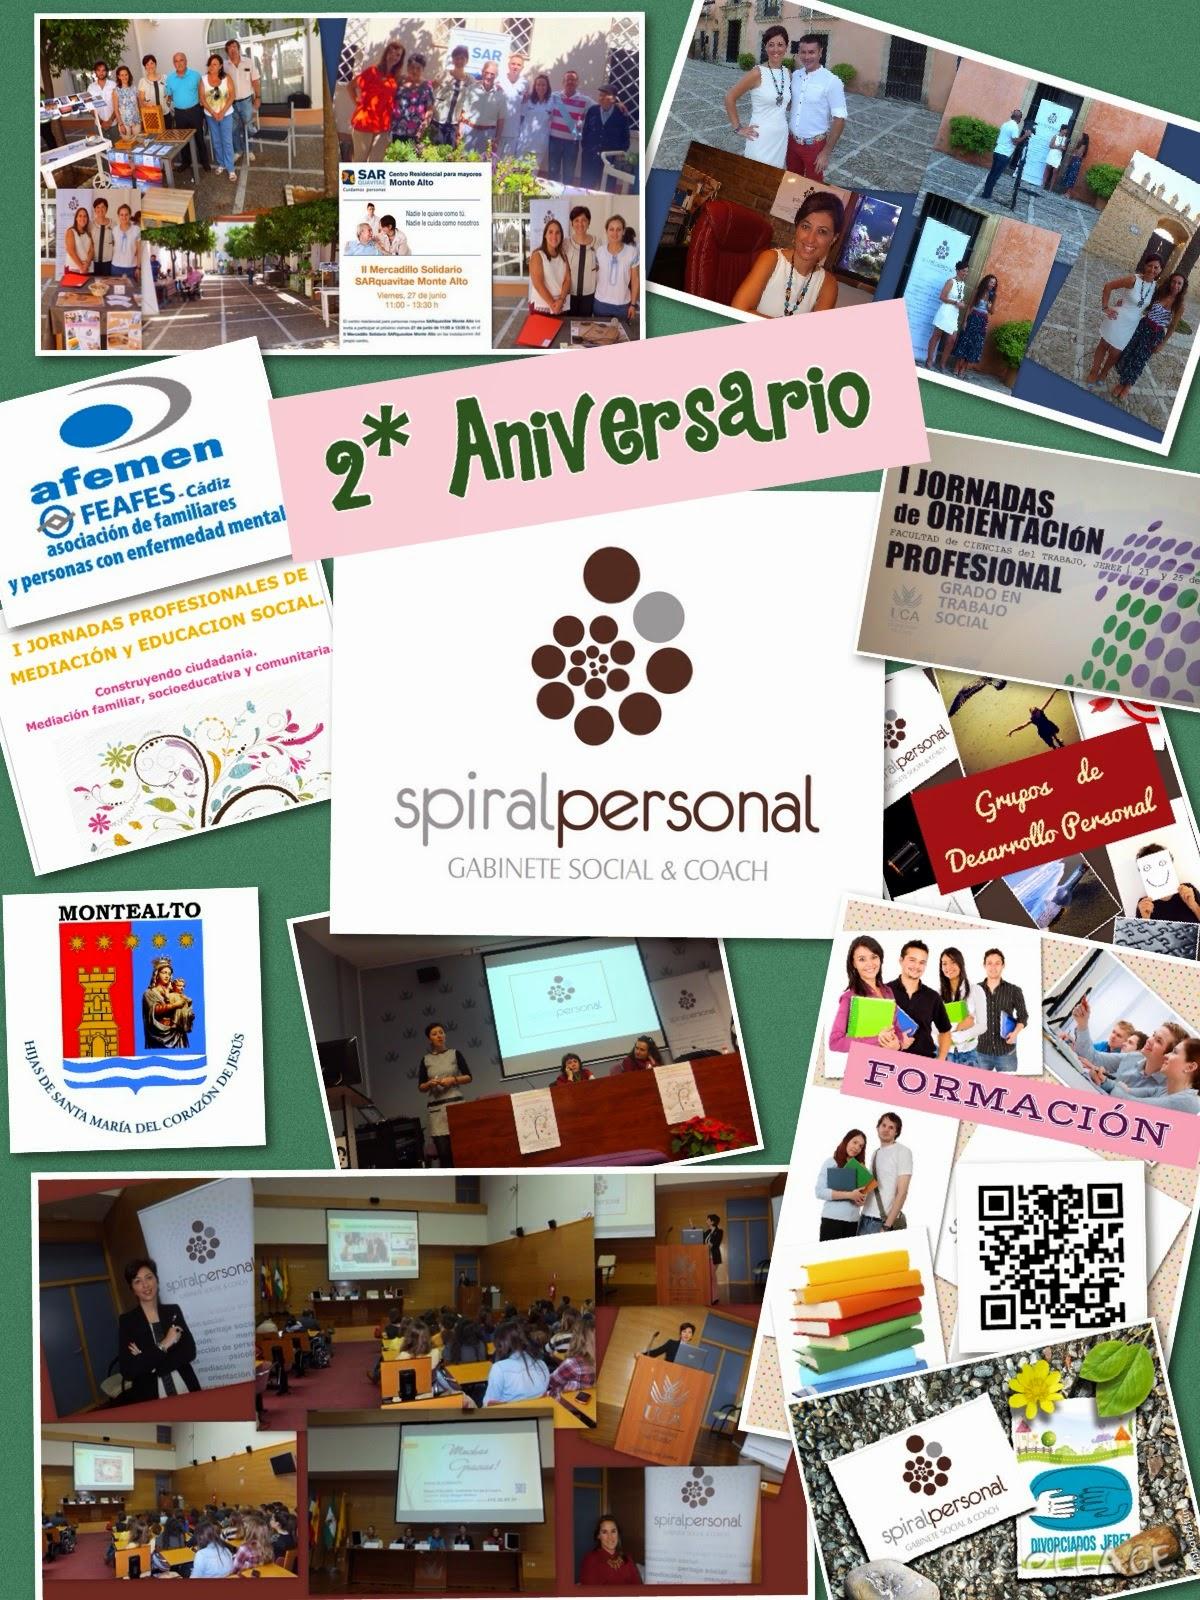 2º Aniversario de Spiral Personal. Gabinete Social & Coach